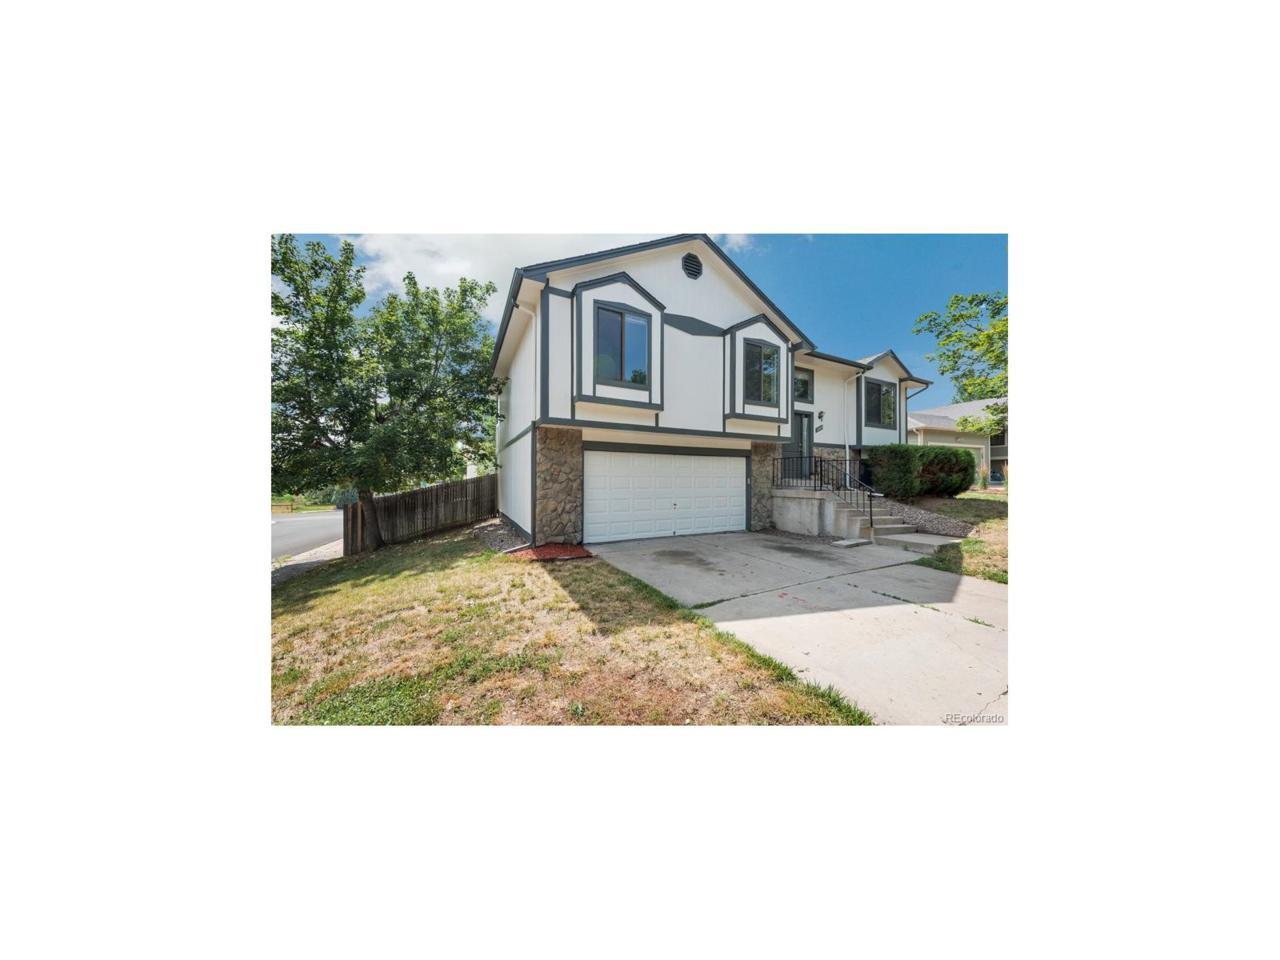 3564 S Telluride Way, Aurora, CO 80013 (MLS #9346140) :: 8z Real Estate